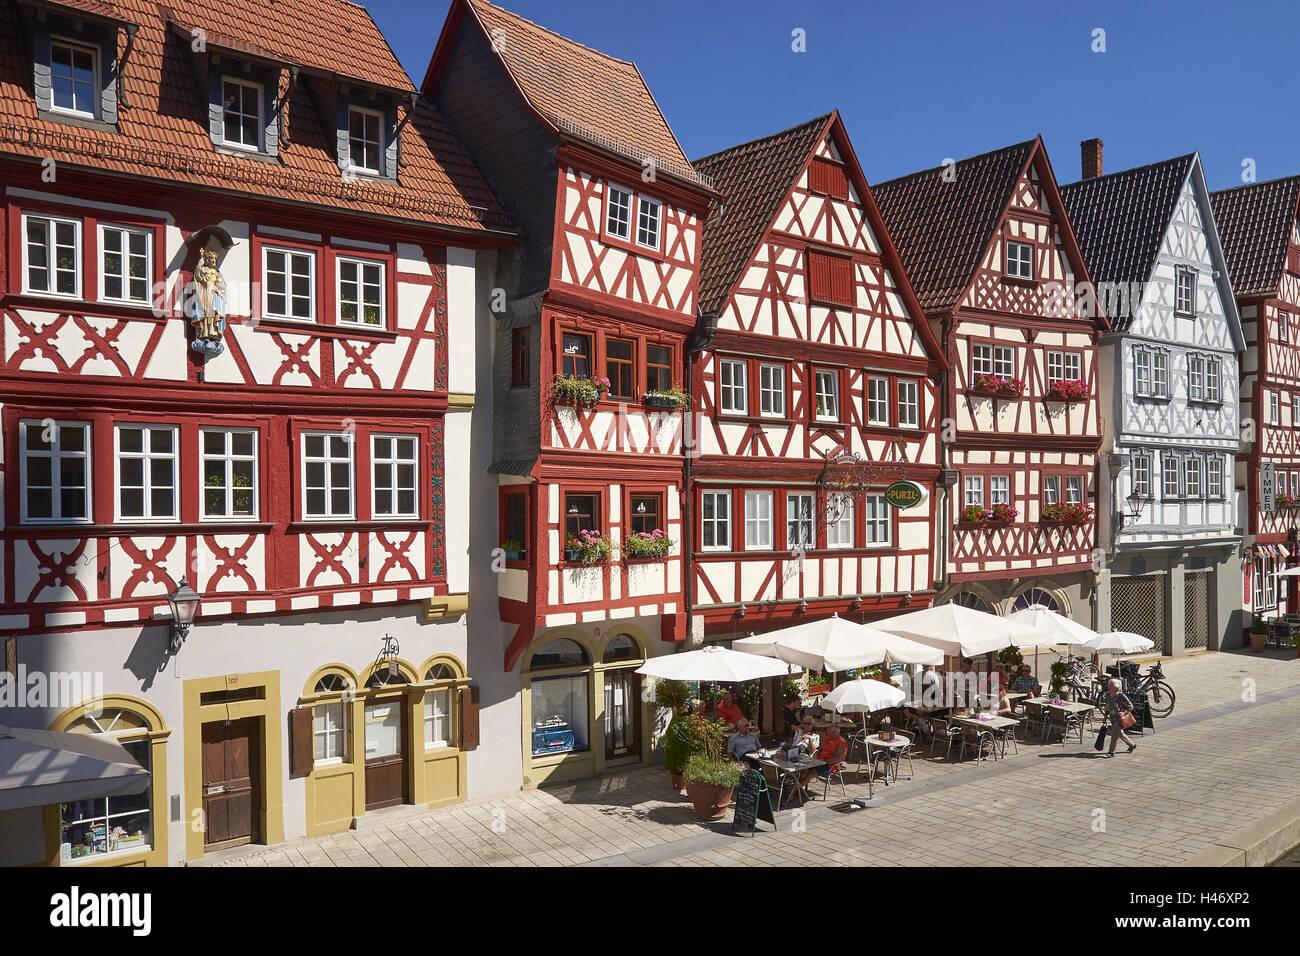 Half-timbered houses in Ochsenfurt, Lower Franconia, Bavaria, Germany Stock Photo